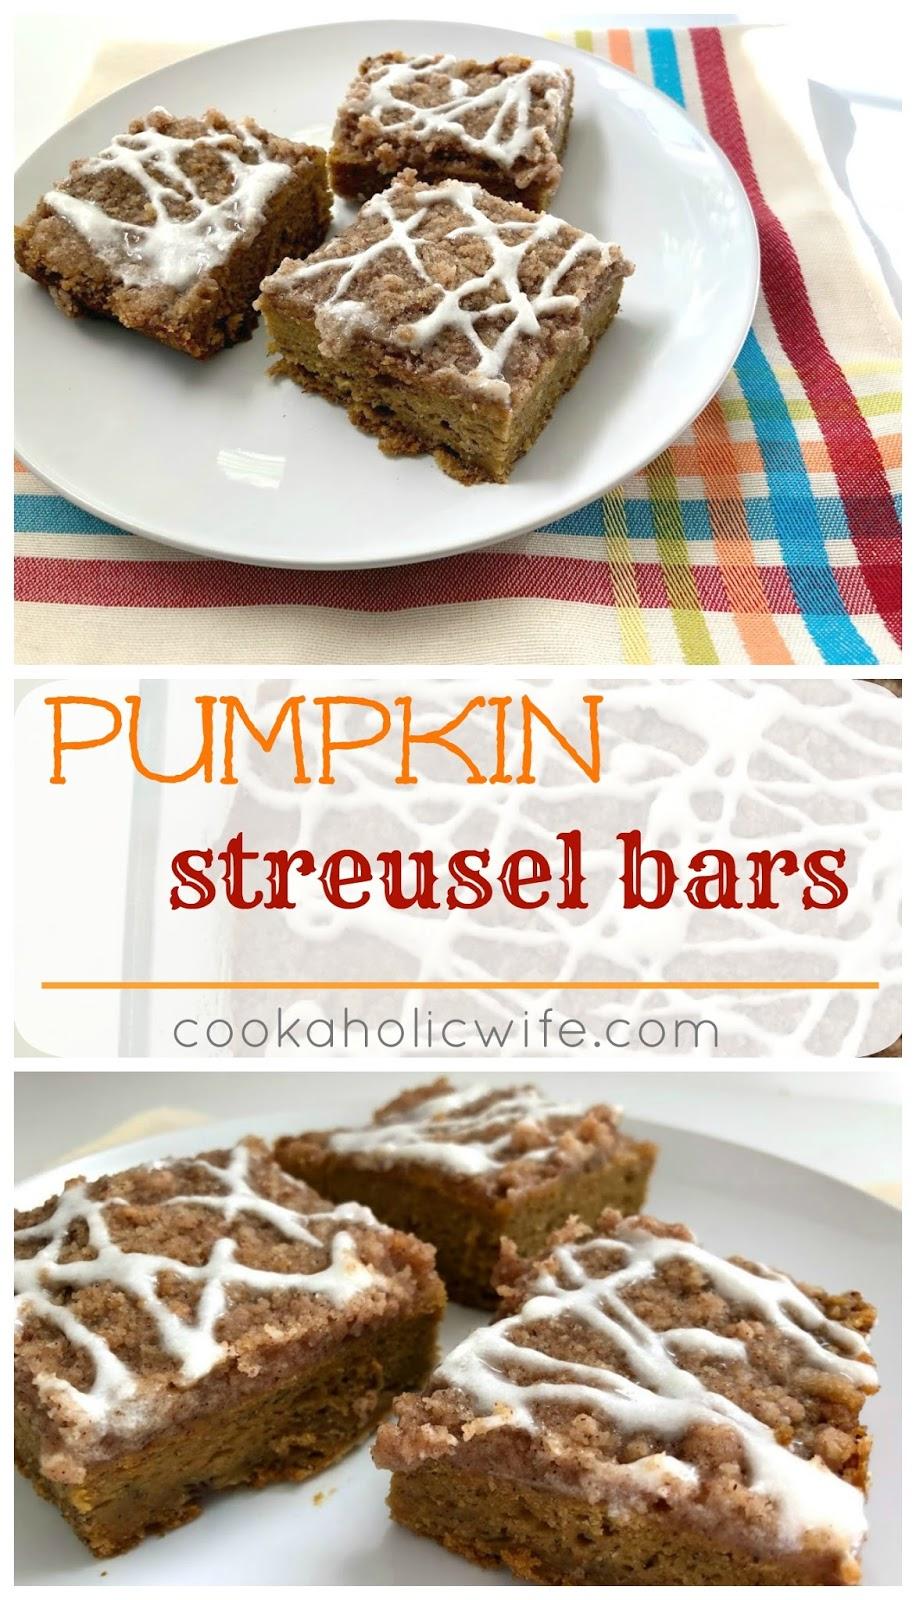 #FilltheCookieJar #PumpkinWeek: Pumpkin Streusel Bars ...